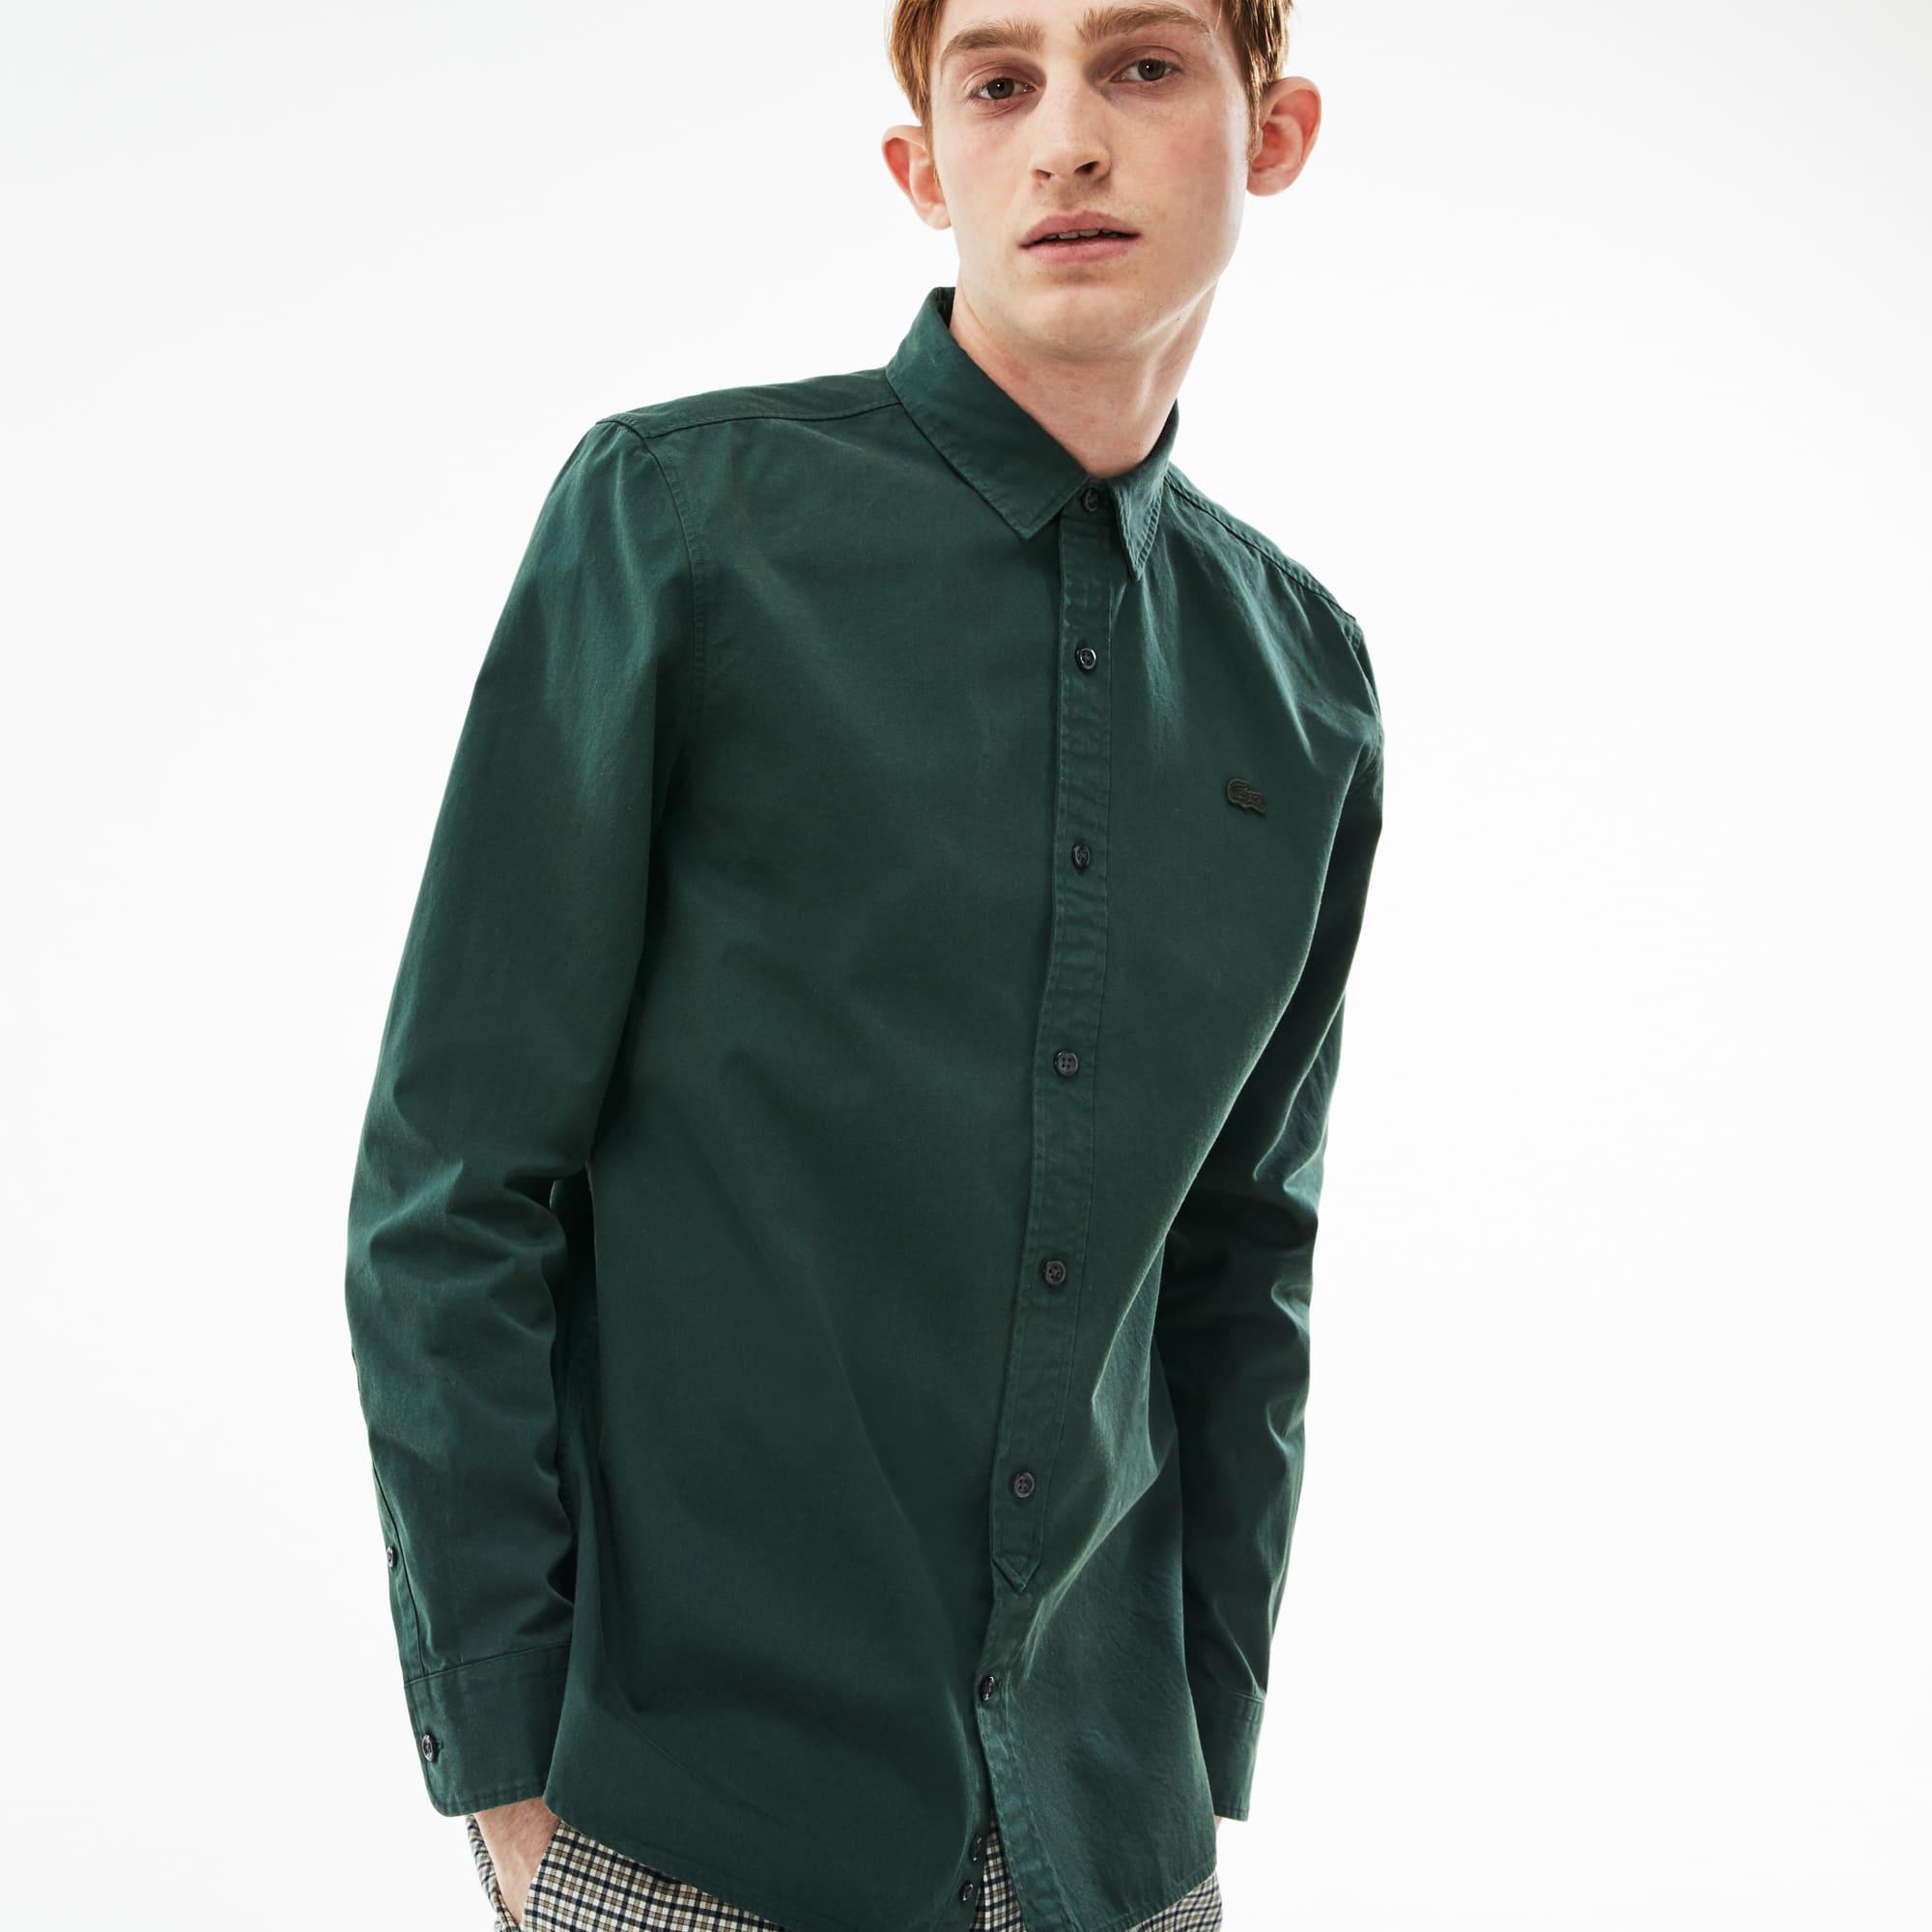 Camisa Lacoste LIVE skinny fit en popelín de algodón. + 2 colores b17afde8b7